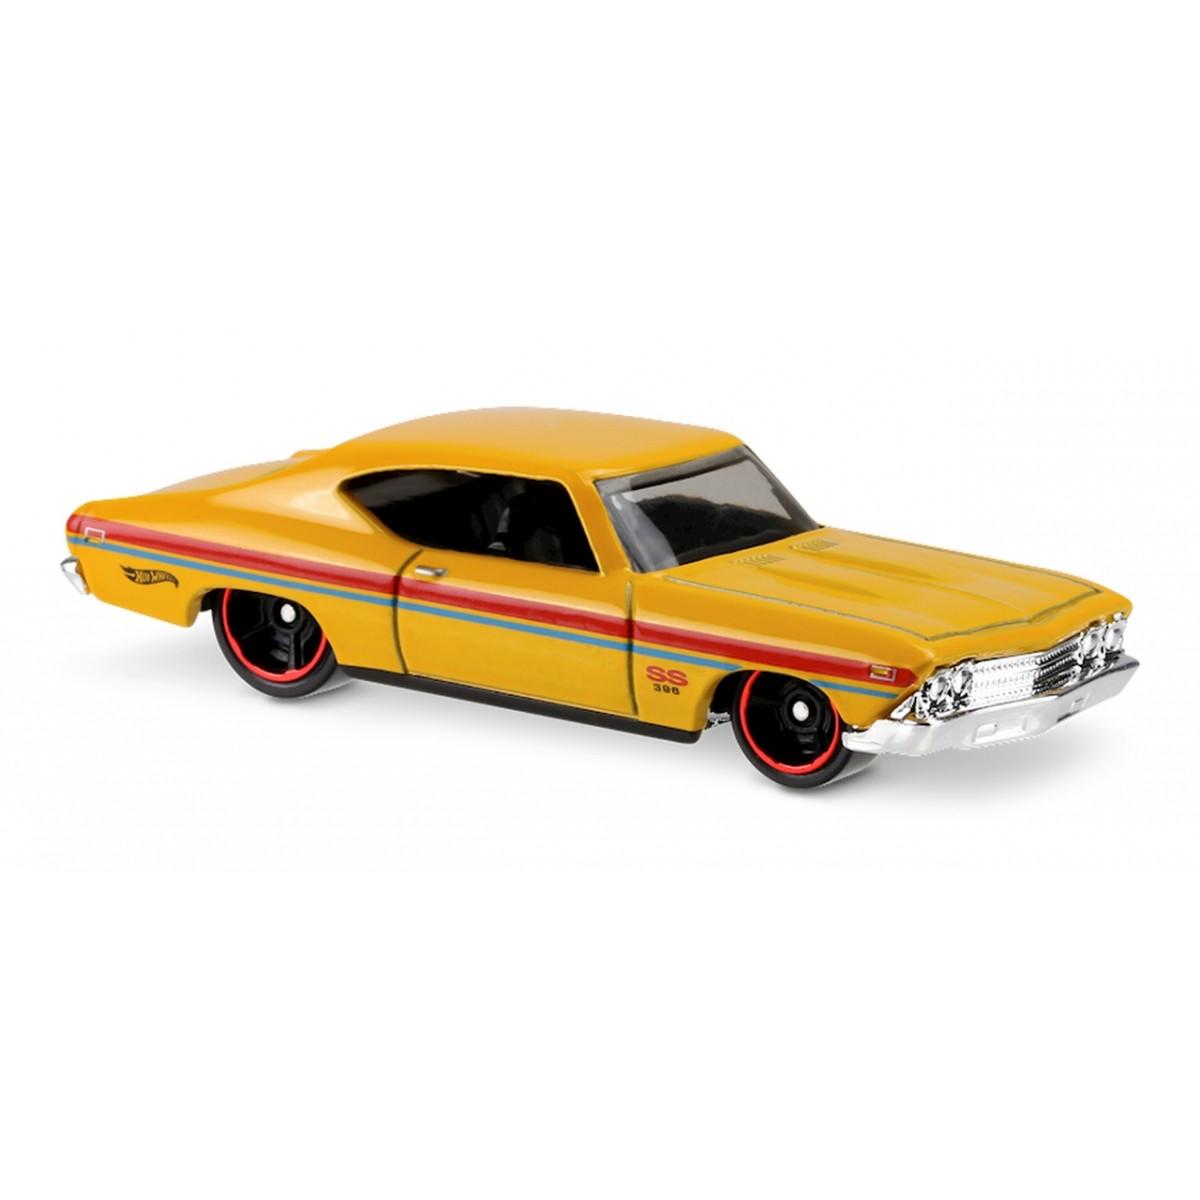 Carrinho Hot Wheels: '69 Chevelle SS 396 Amarelo